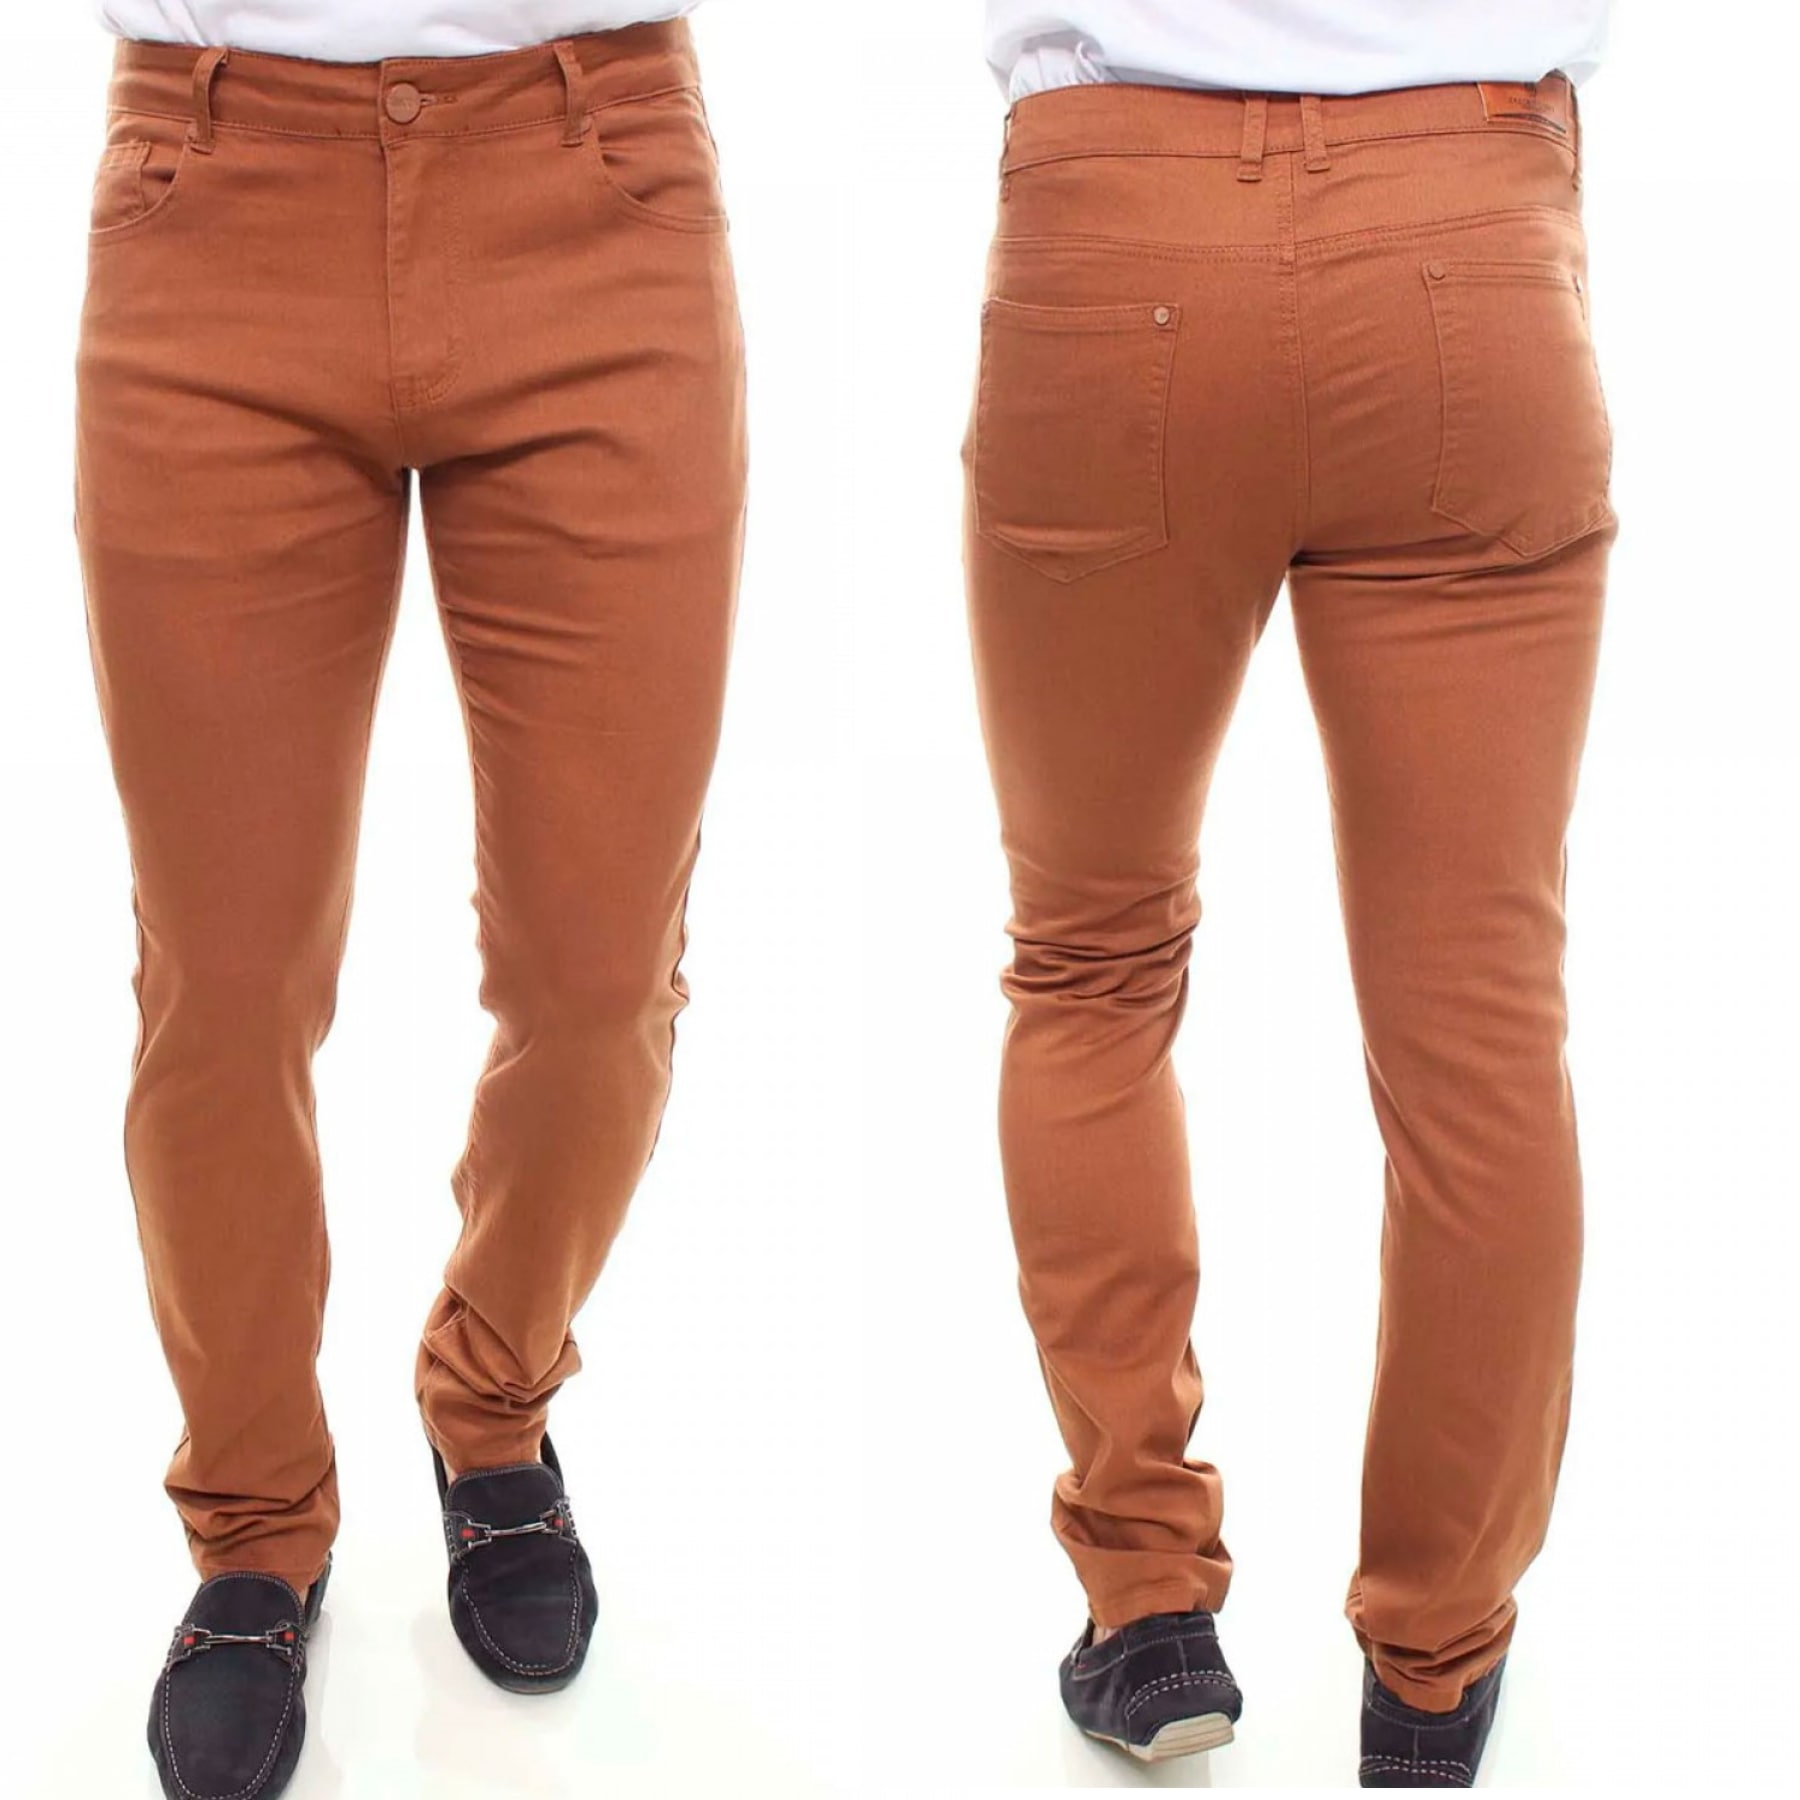 Calça Jeans Masculina Color Confort